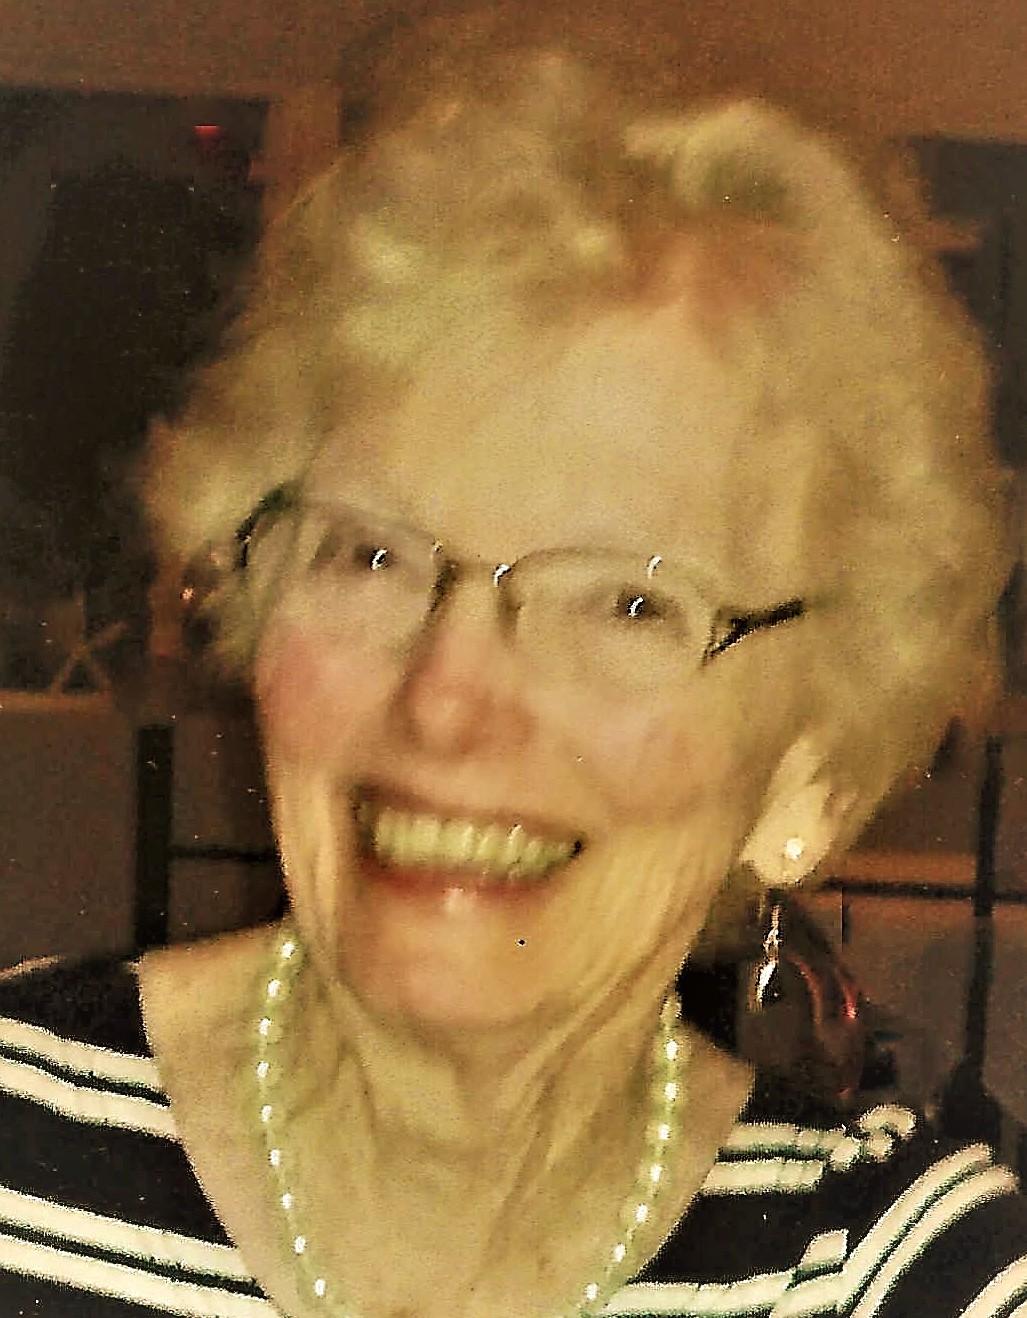 Patricia J. Callahan